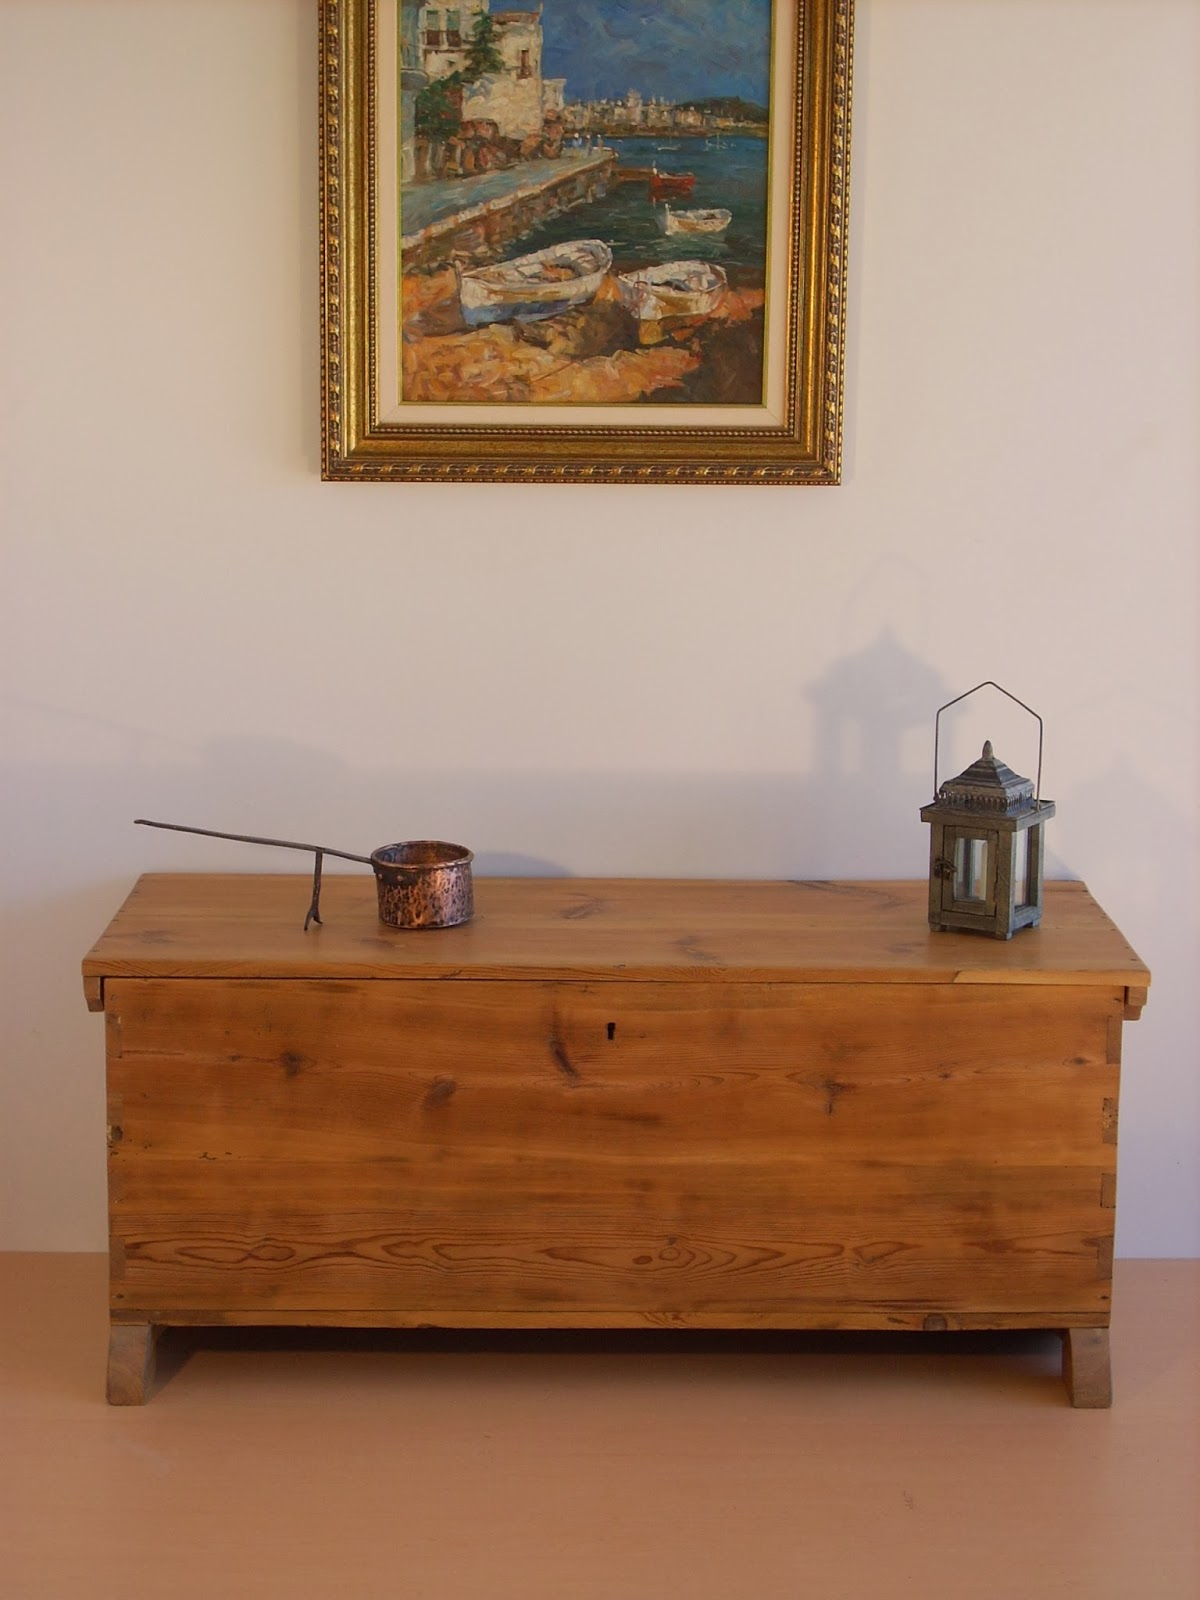 Fotos de muebles antiguos restaurados for Muebles antiguos para restaurar